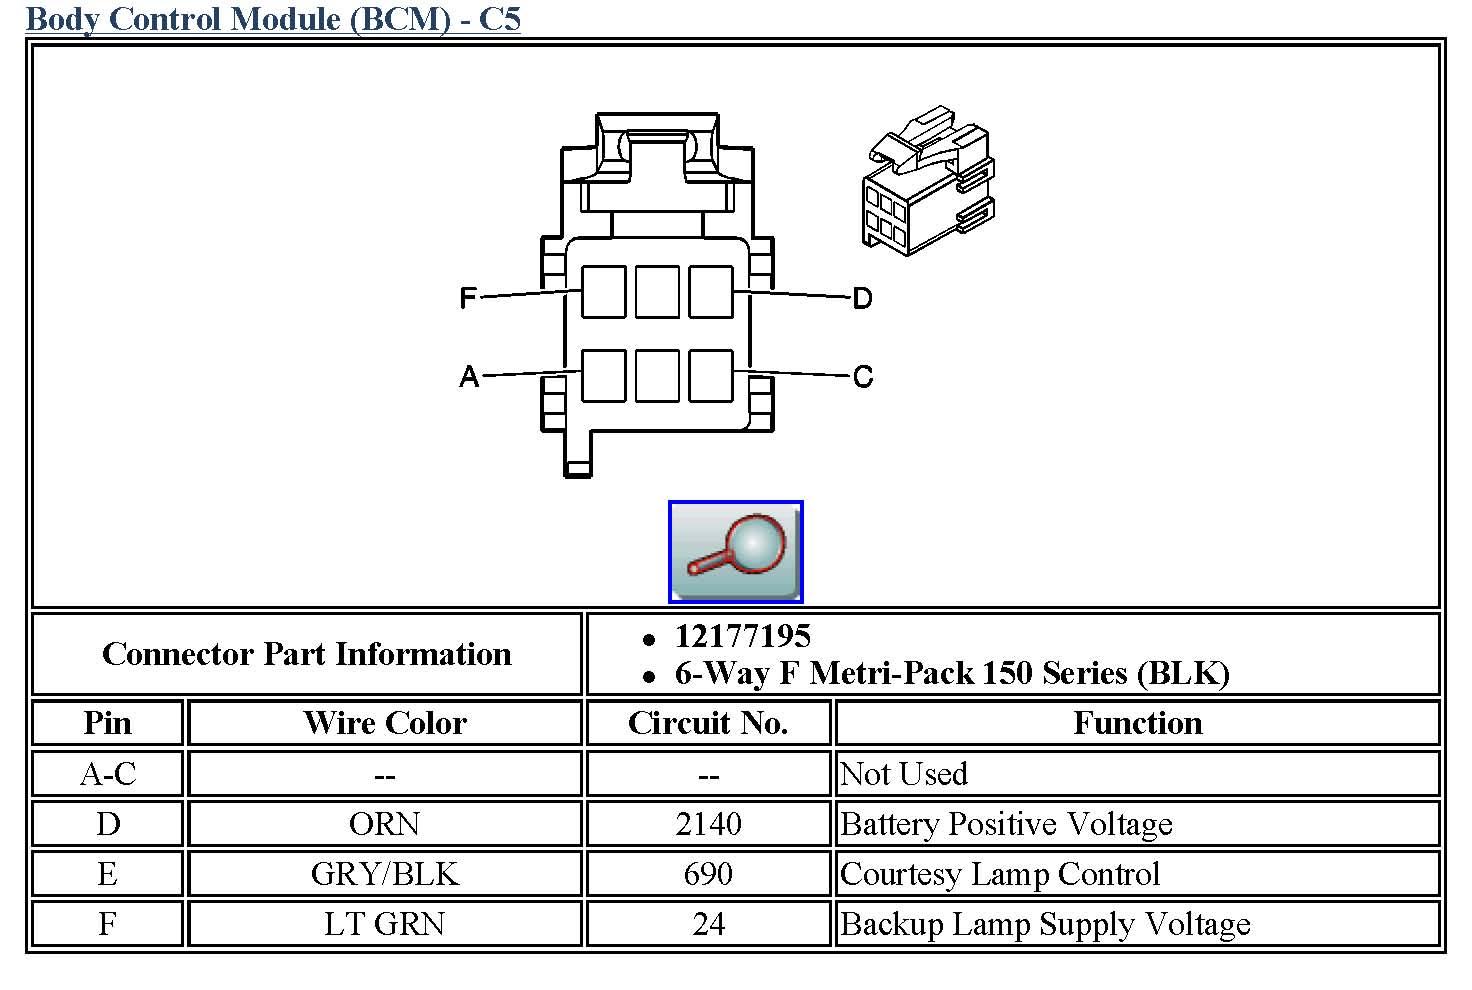 03bcmc5?resize\\\\\\\\\\\\\\\\\\\\\\\\\\\\\\\=665%2C447 gm backup camera wiring diagram gm wiring diagrams collection  at soozxer.org